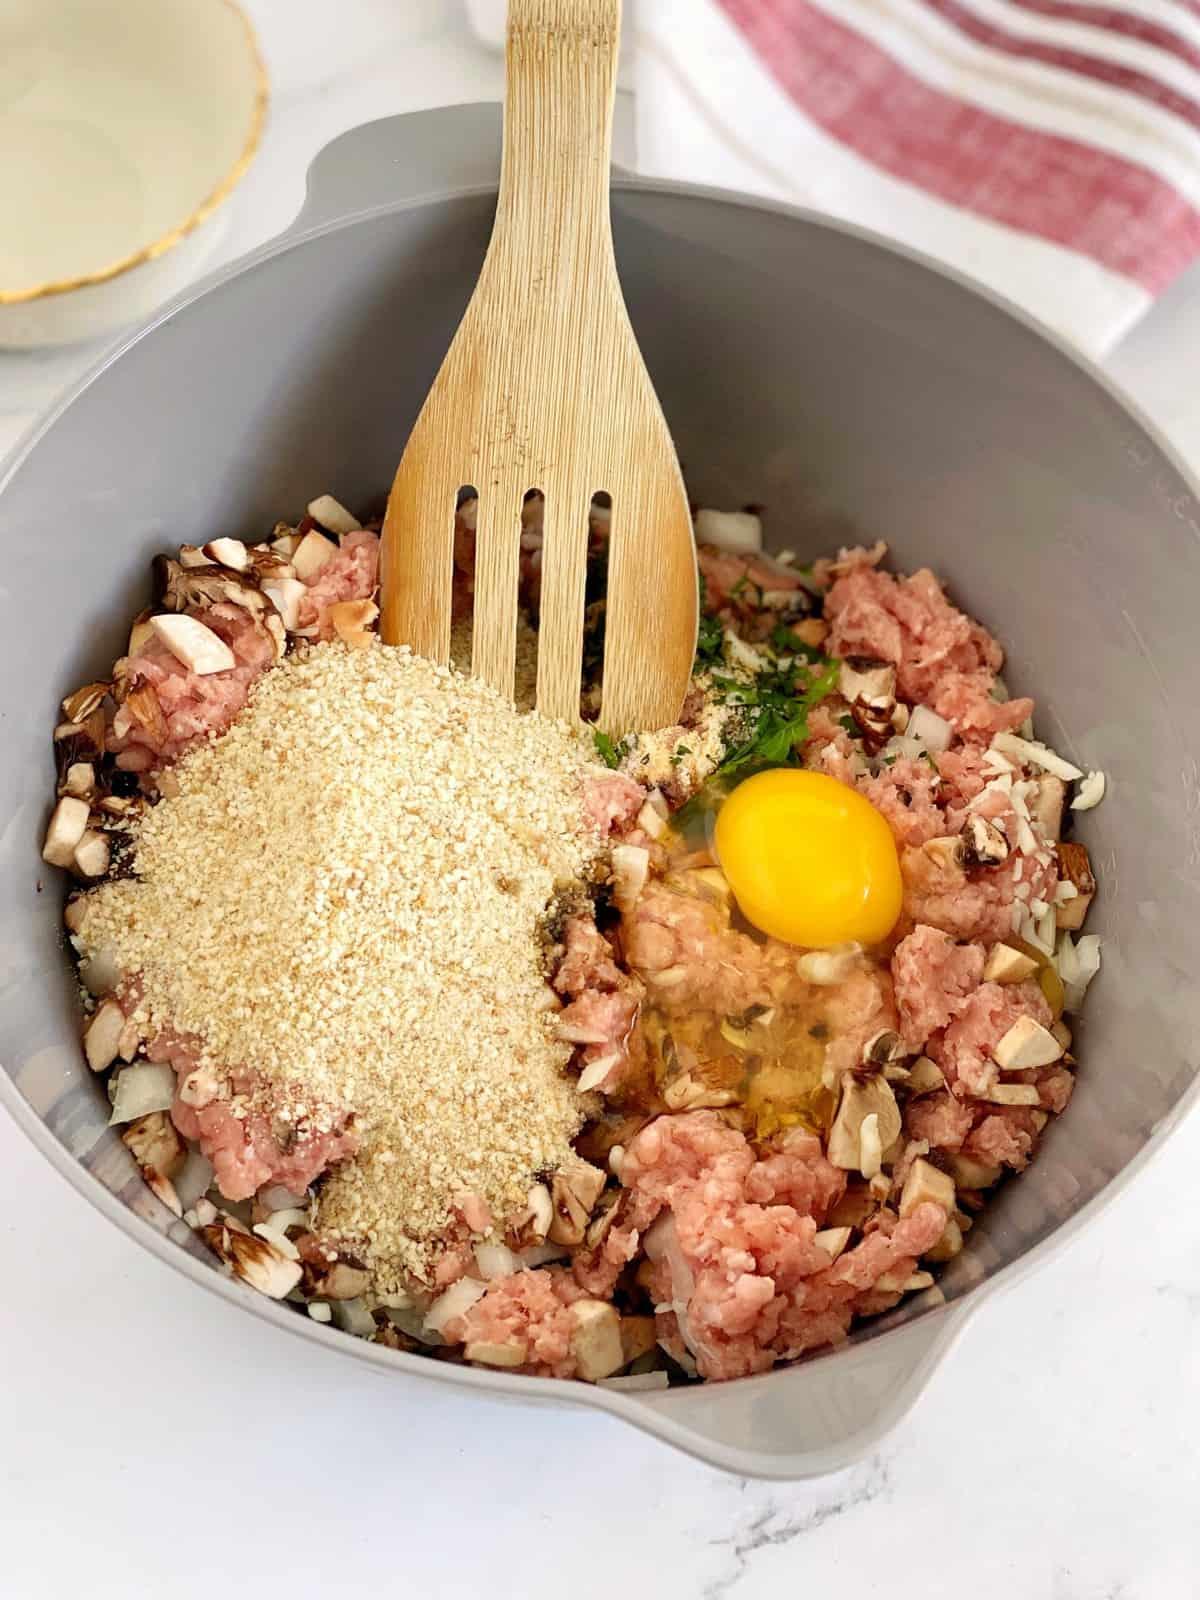 bowl of ground turkey egg and seasonings